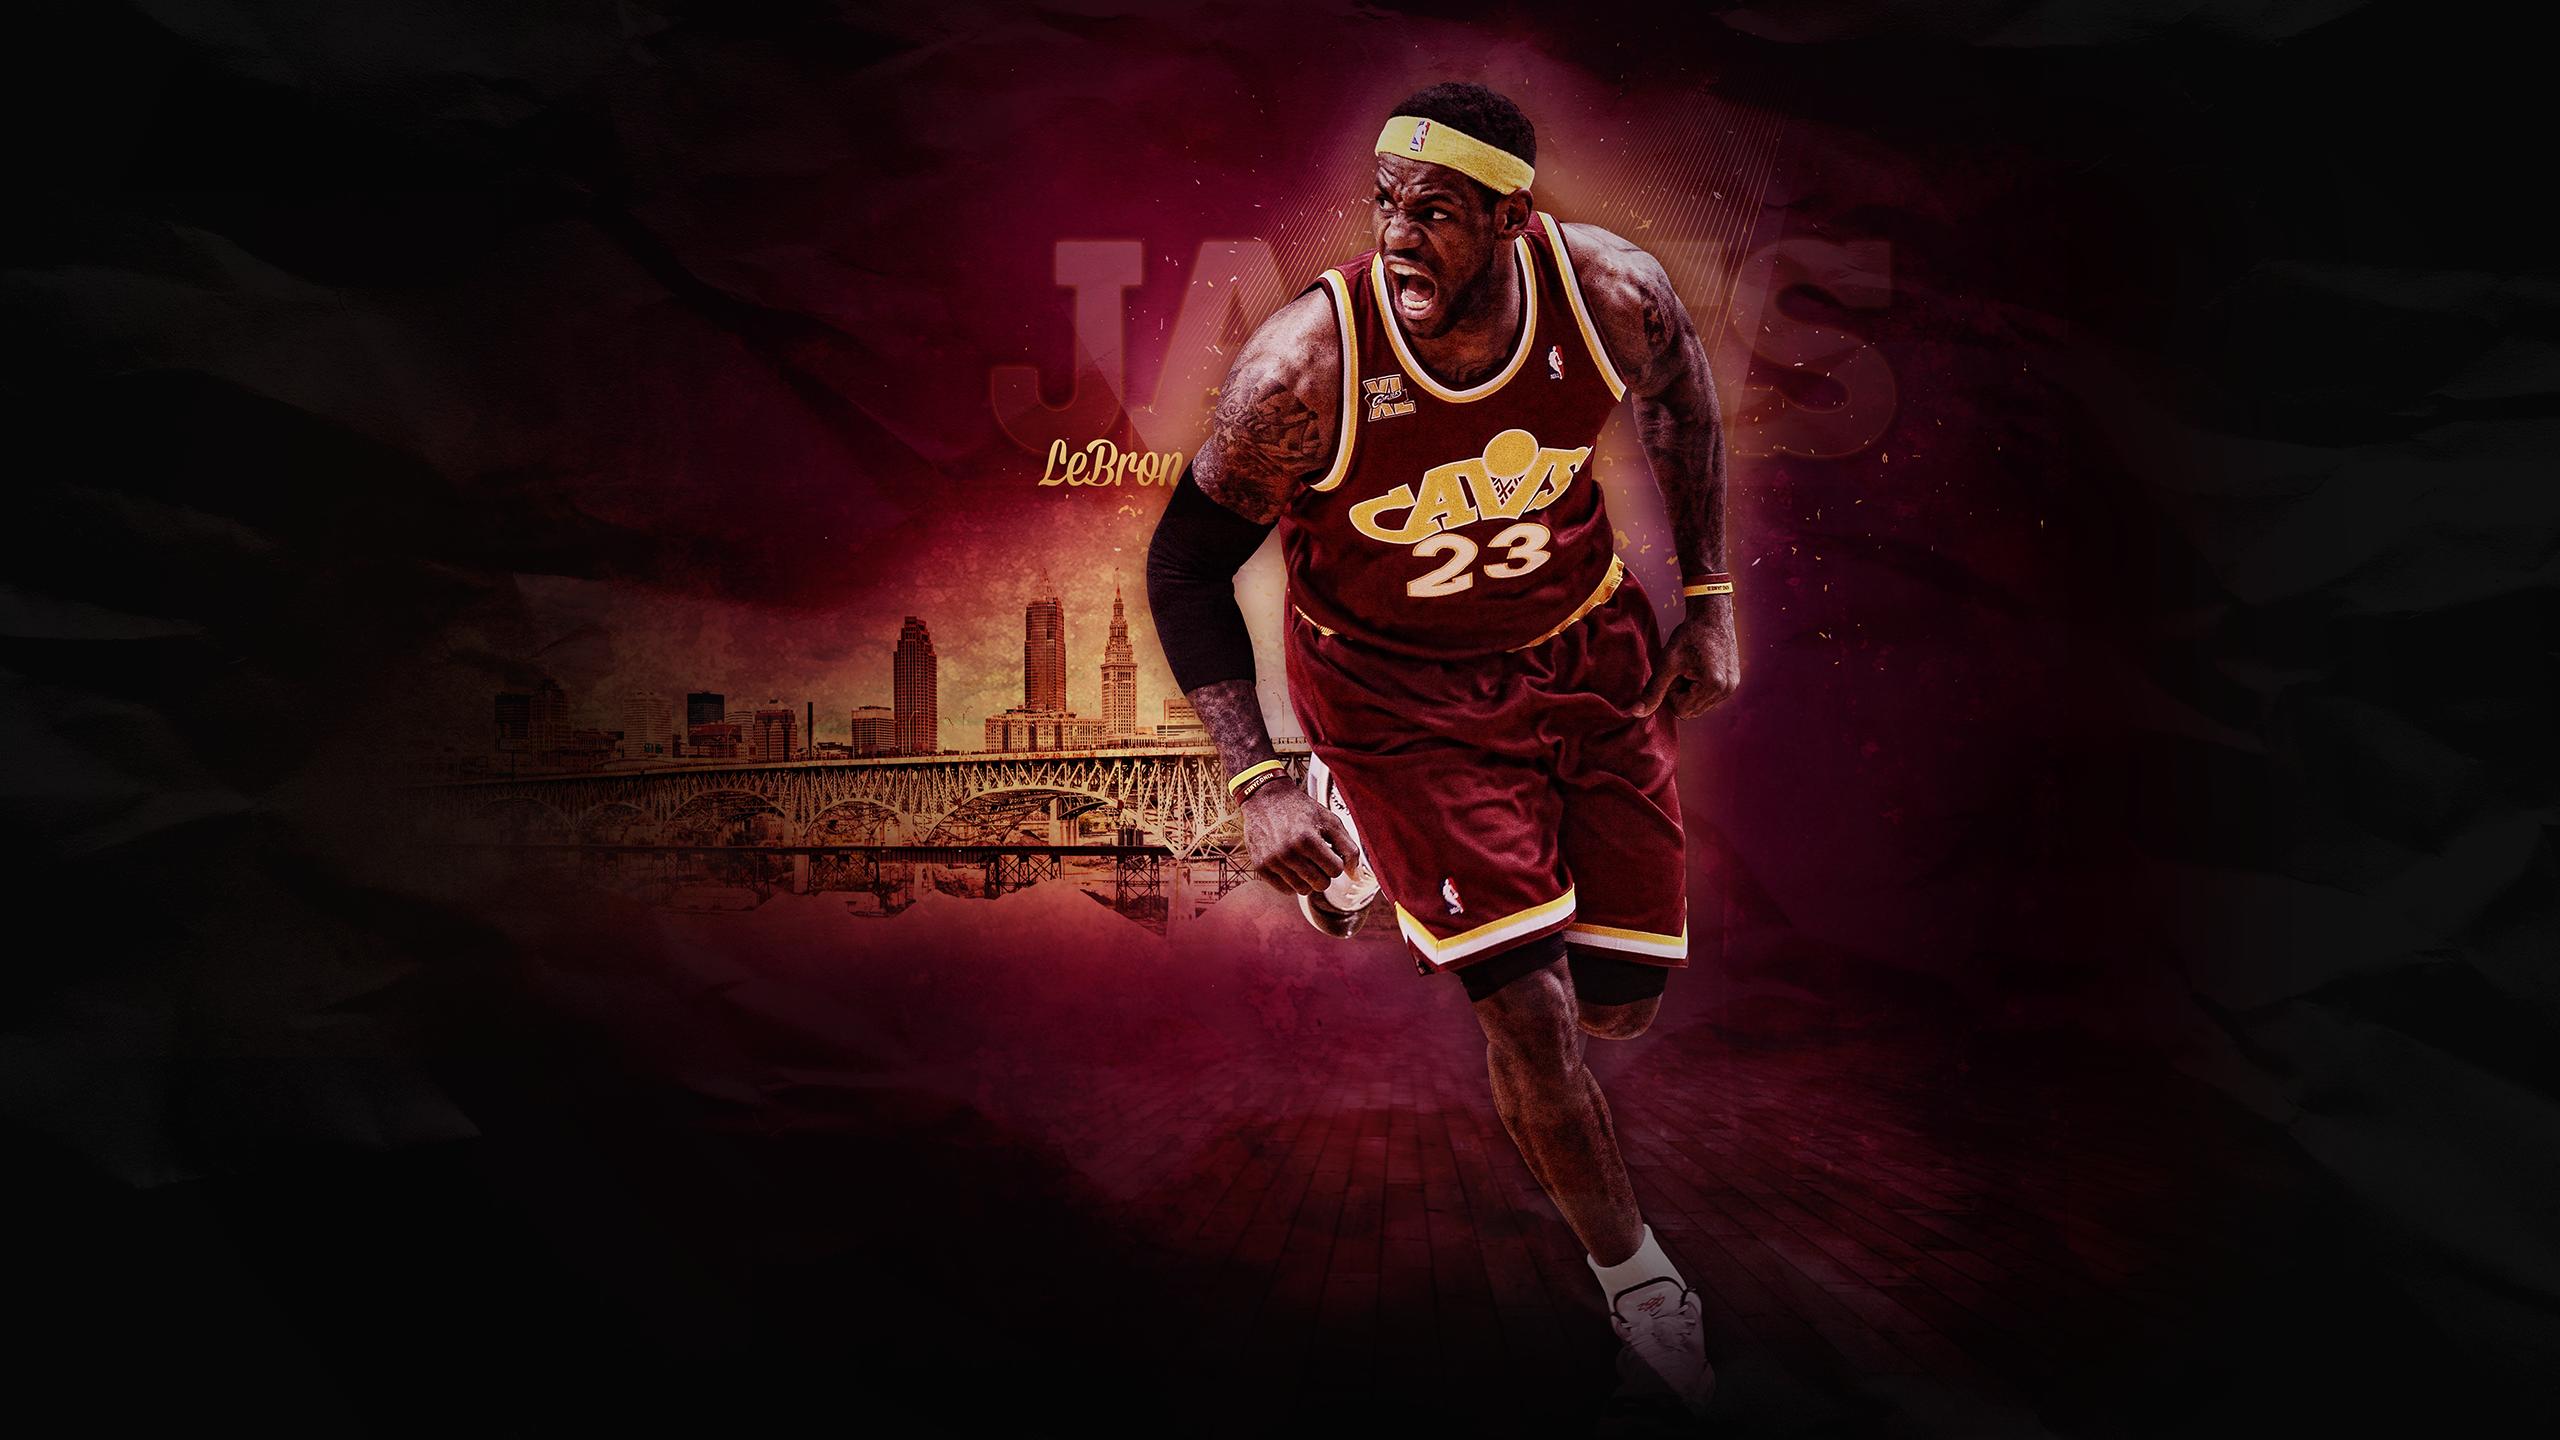 Fan Wallpapers | Cleveland Cavaliers